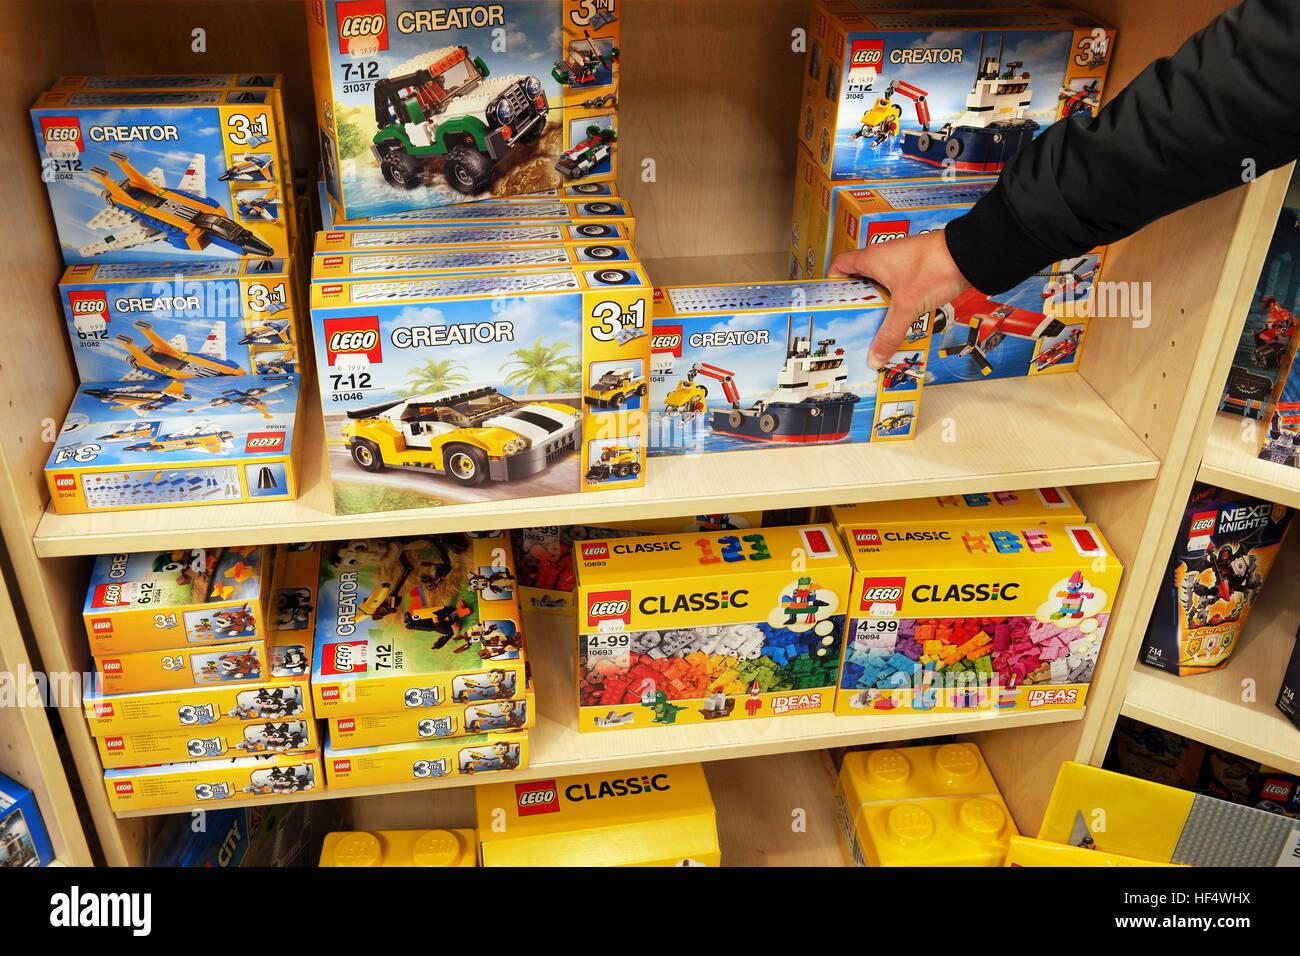 Lego creation and Lego classic boxes - Stock Image